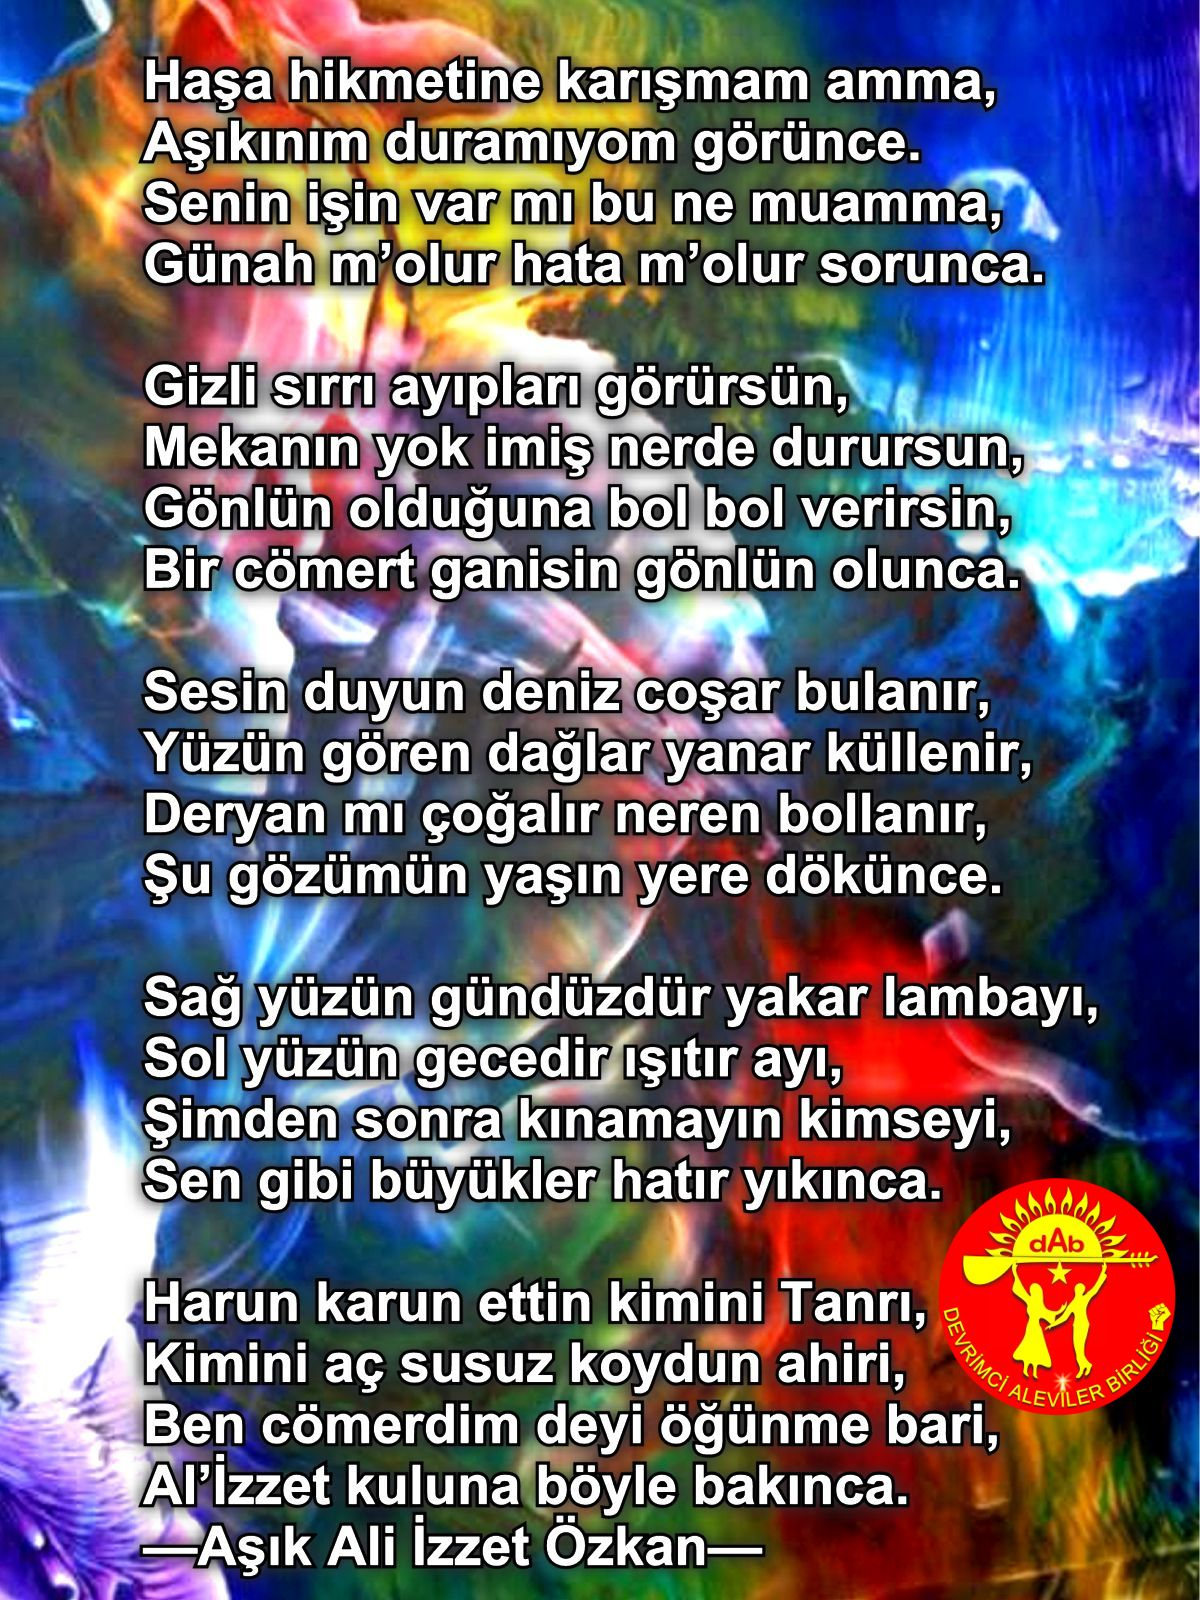 Alevi Bektaşi Kızılbaş Pir Sultan Devrimci Aleviler Birliği DAB tanri3